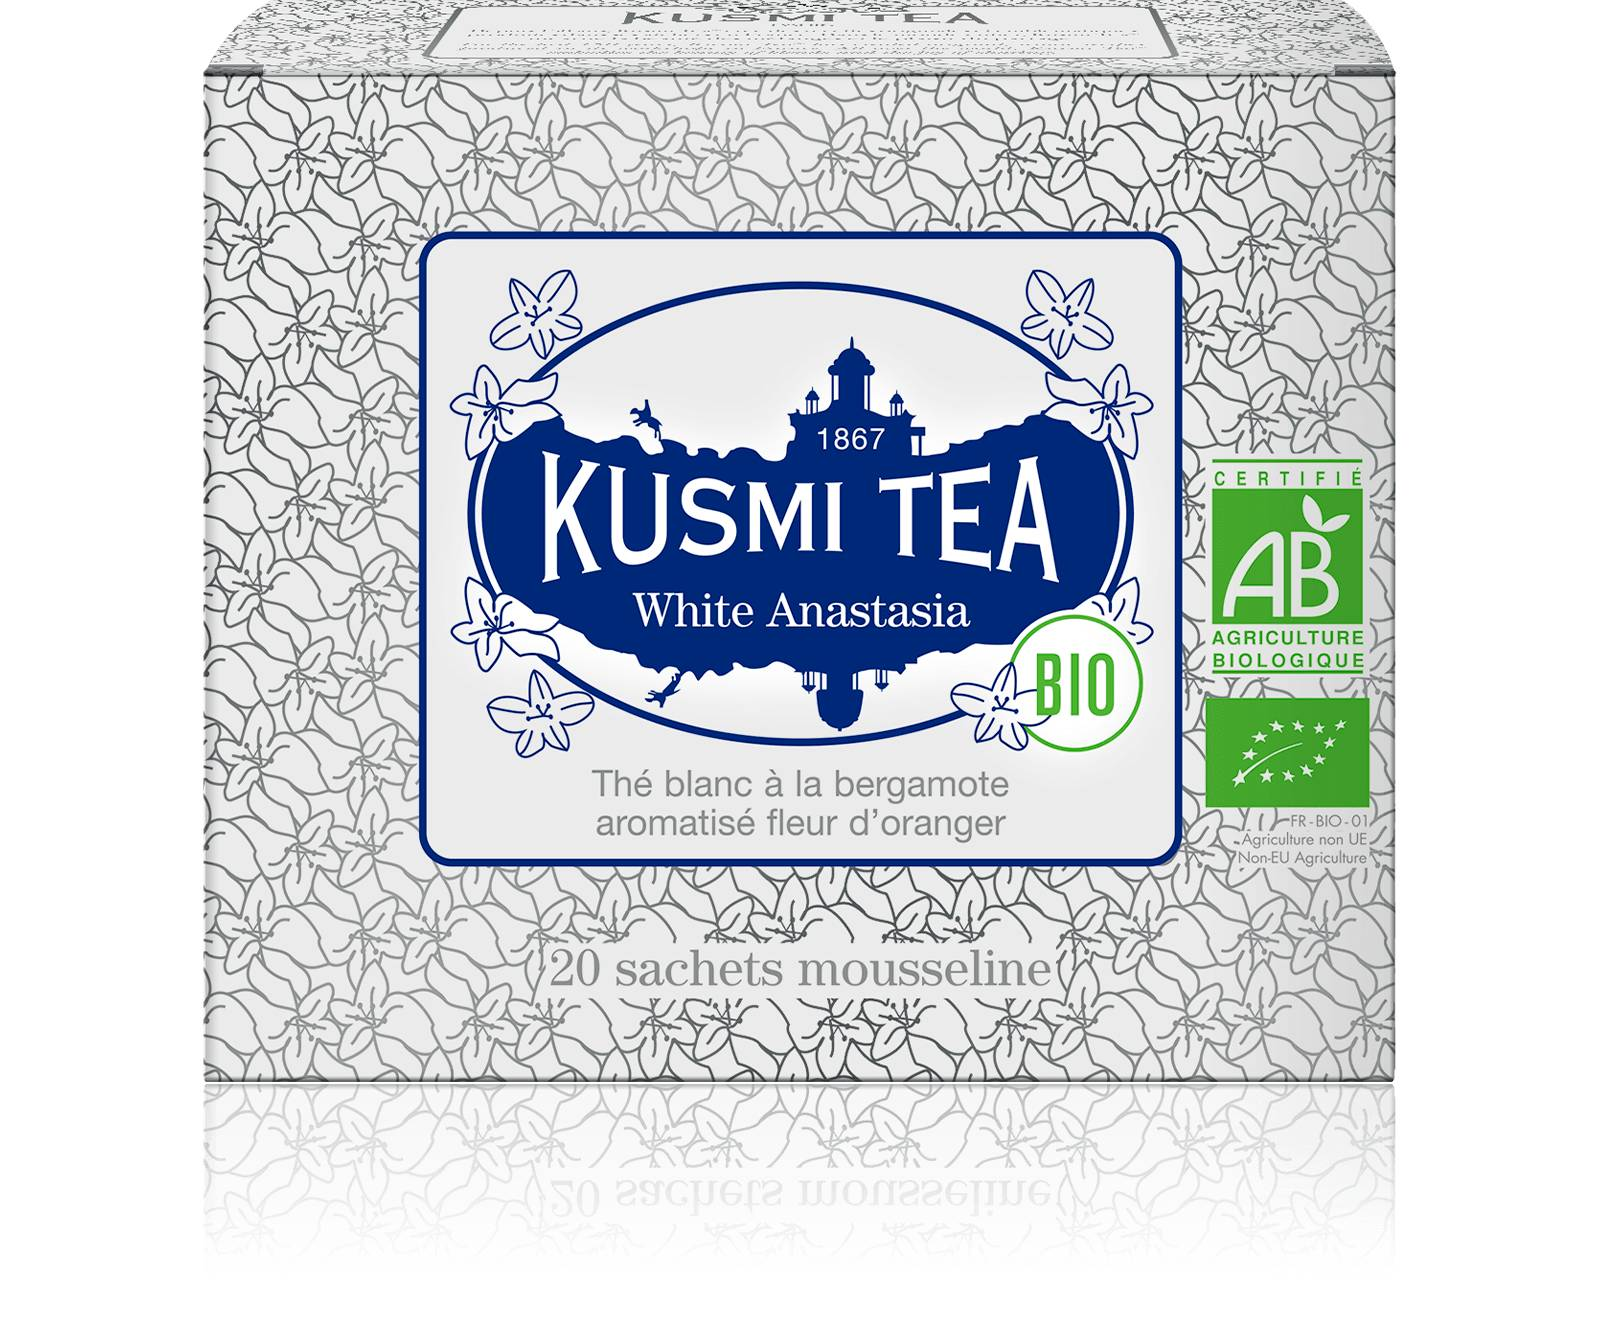 KUSMI TEA White Anastasia bio - Thé blanc, bergamote - Sachets de thé - Kusmi Tea